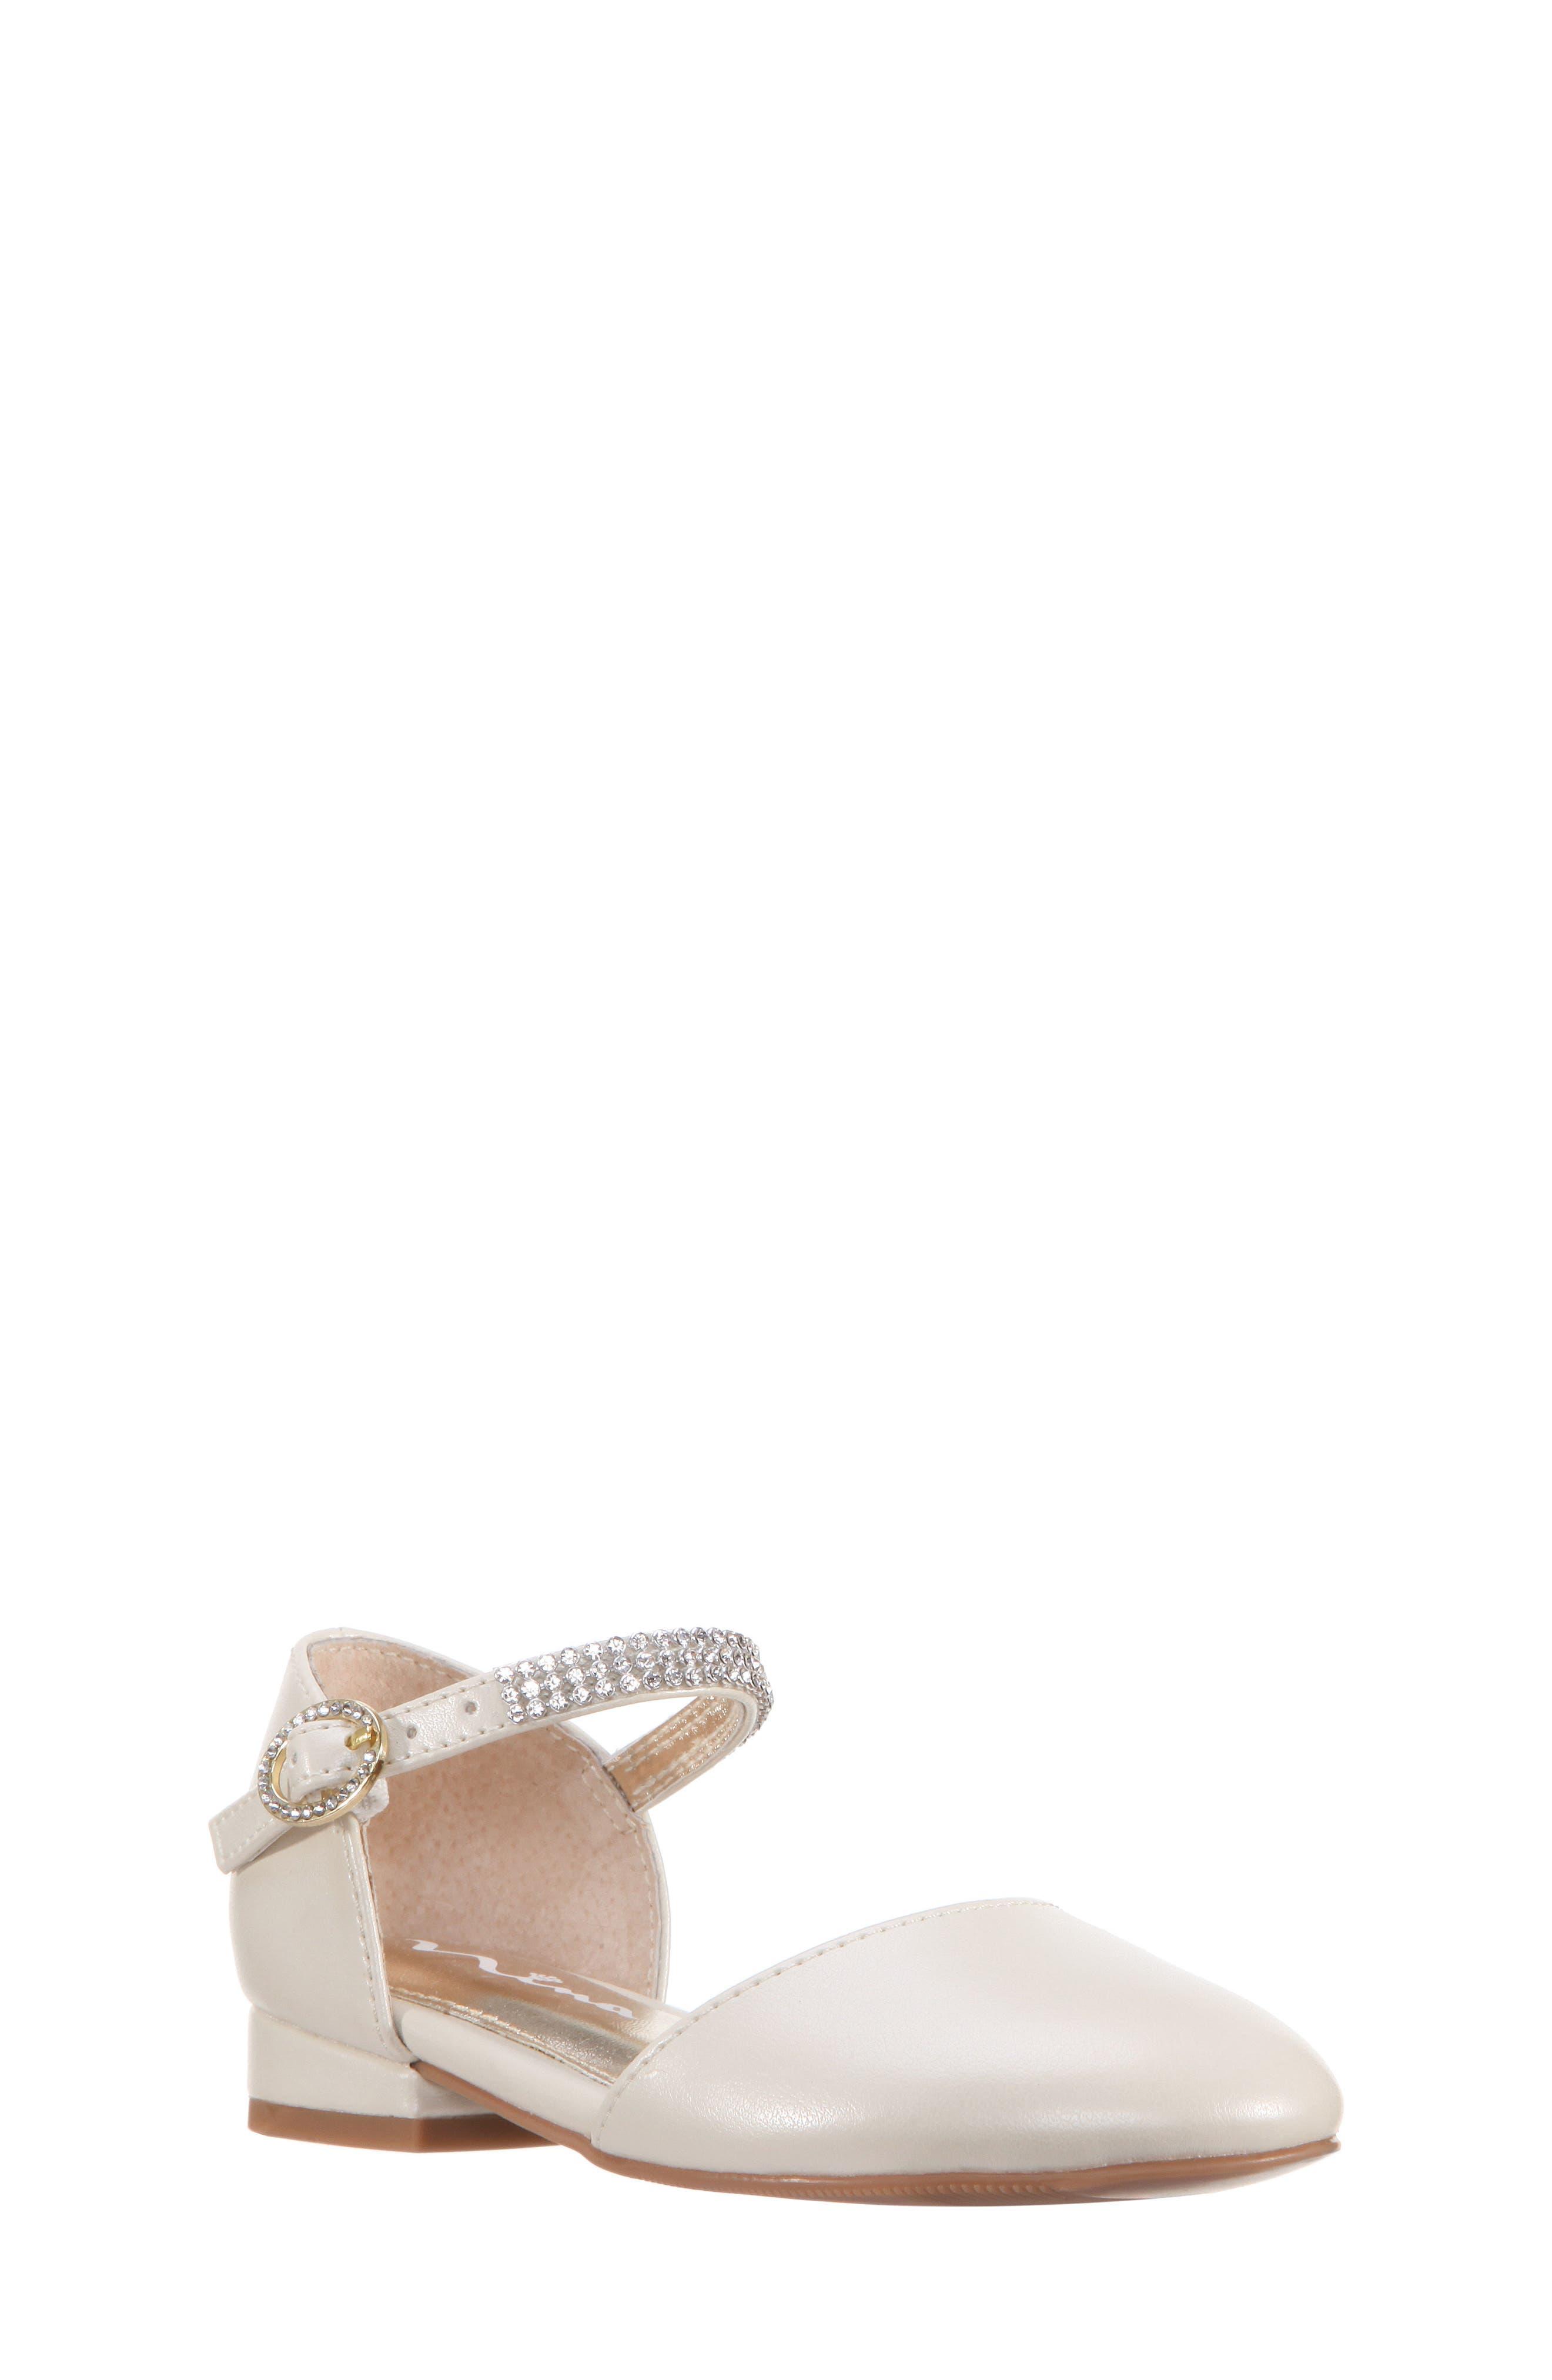 Cara Crystal Embellished d'Orsay Sandal,                         Main,                         color, Bone Pearlized